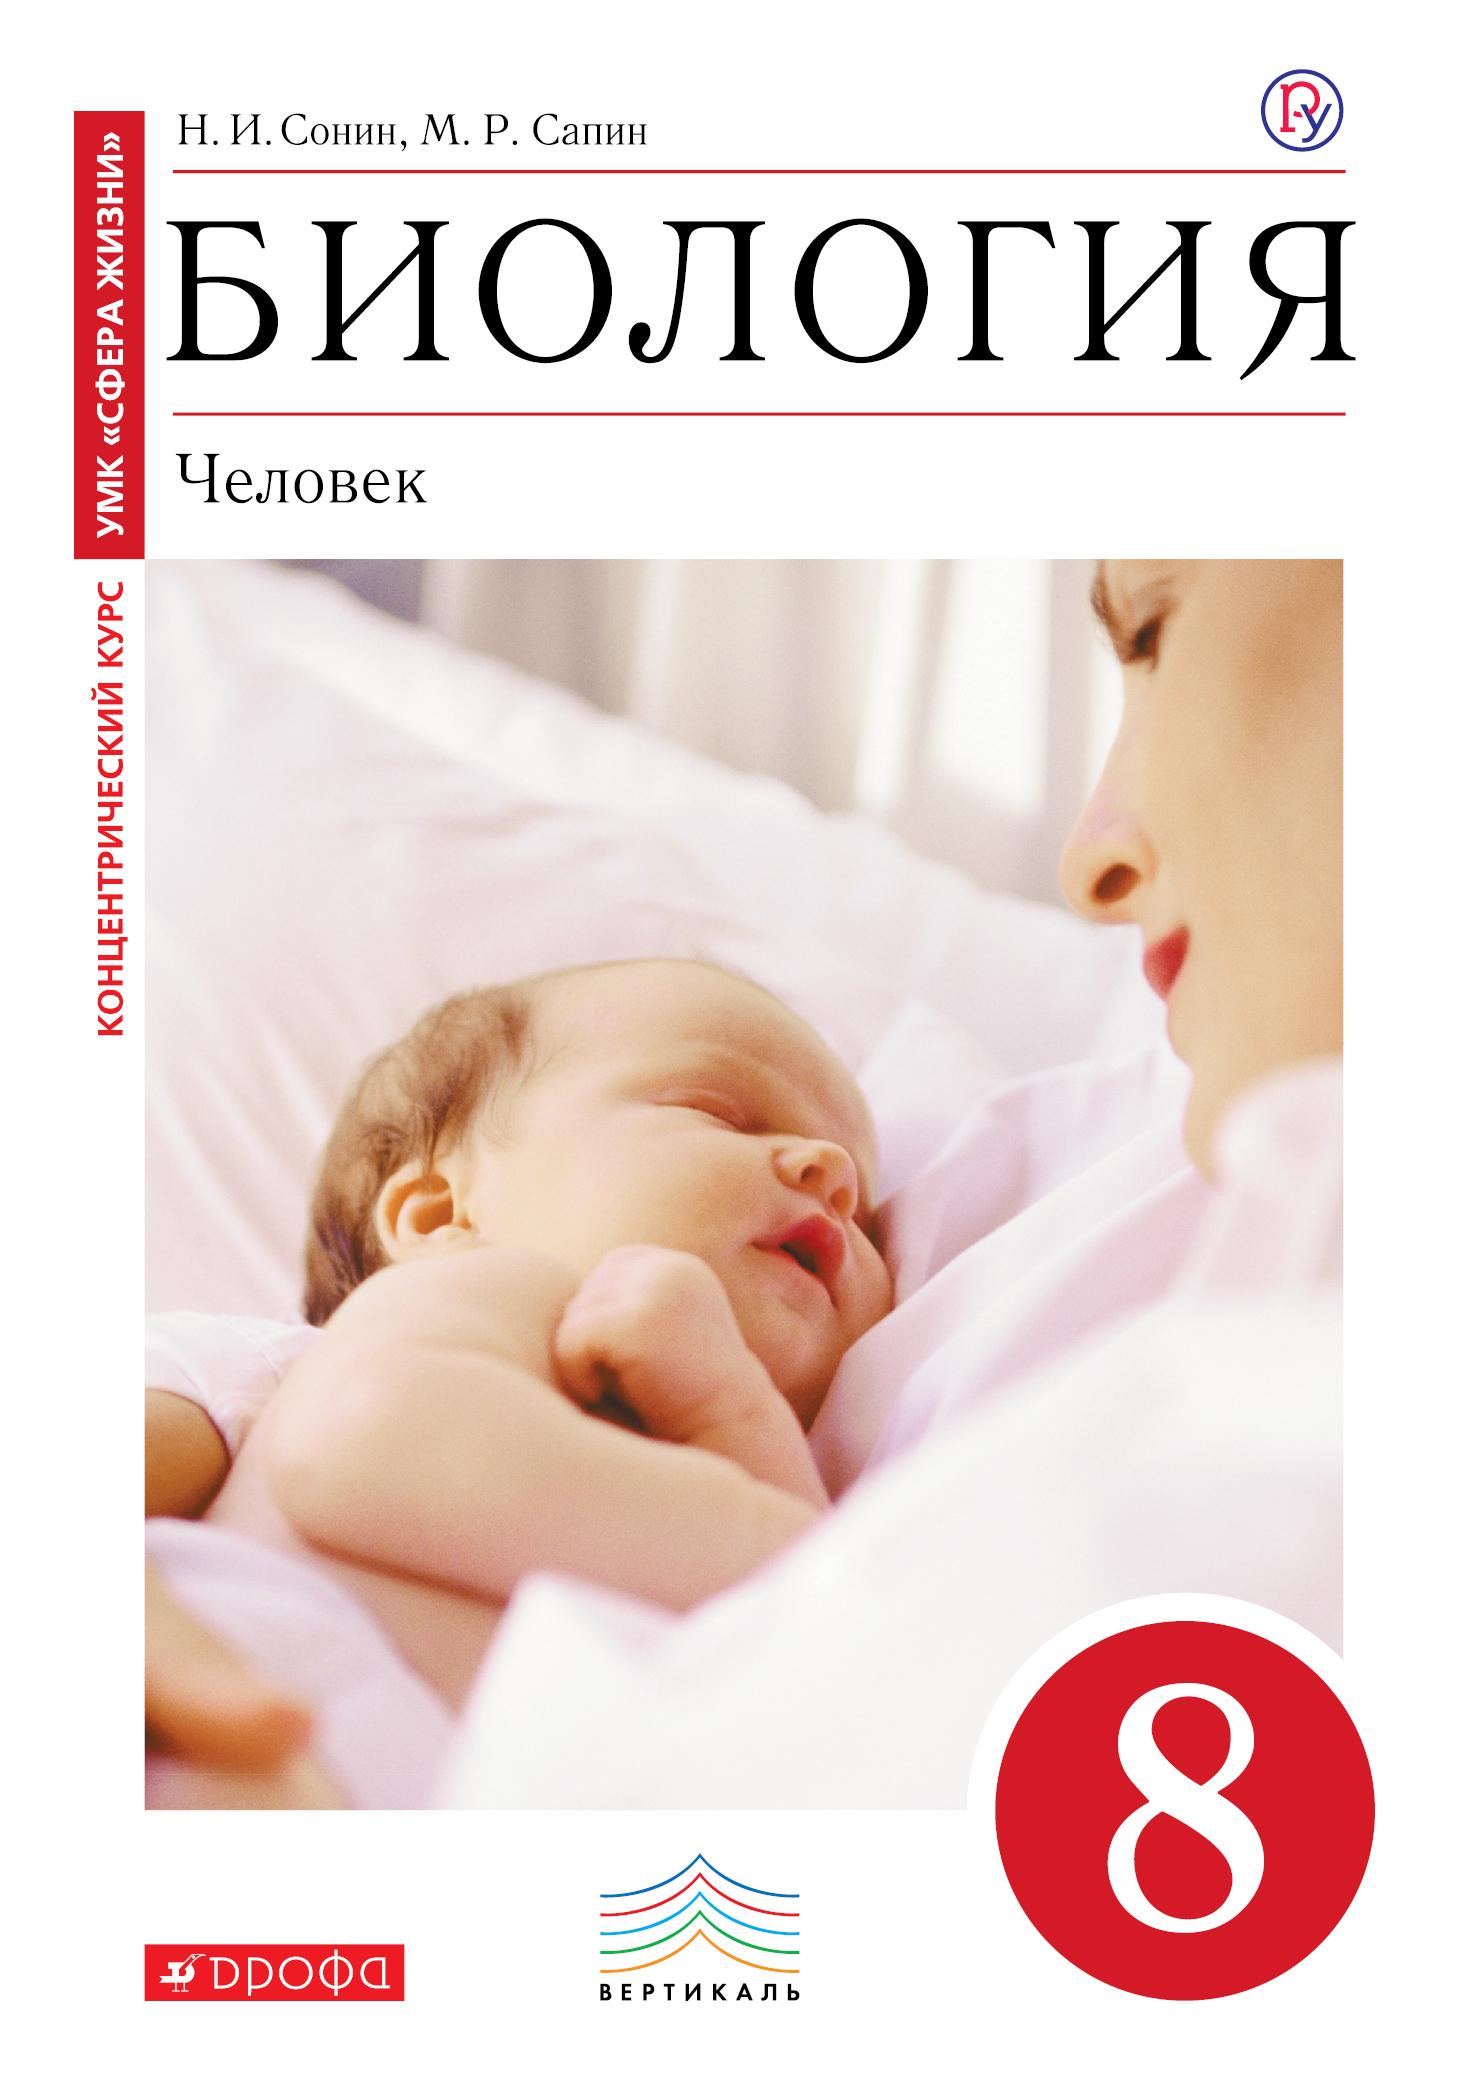 Сапин М.Р. Биология. 8 класс. Учебник